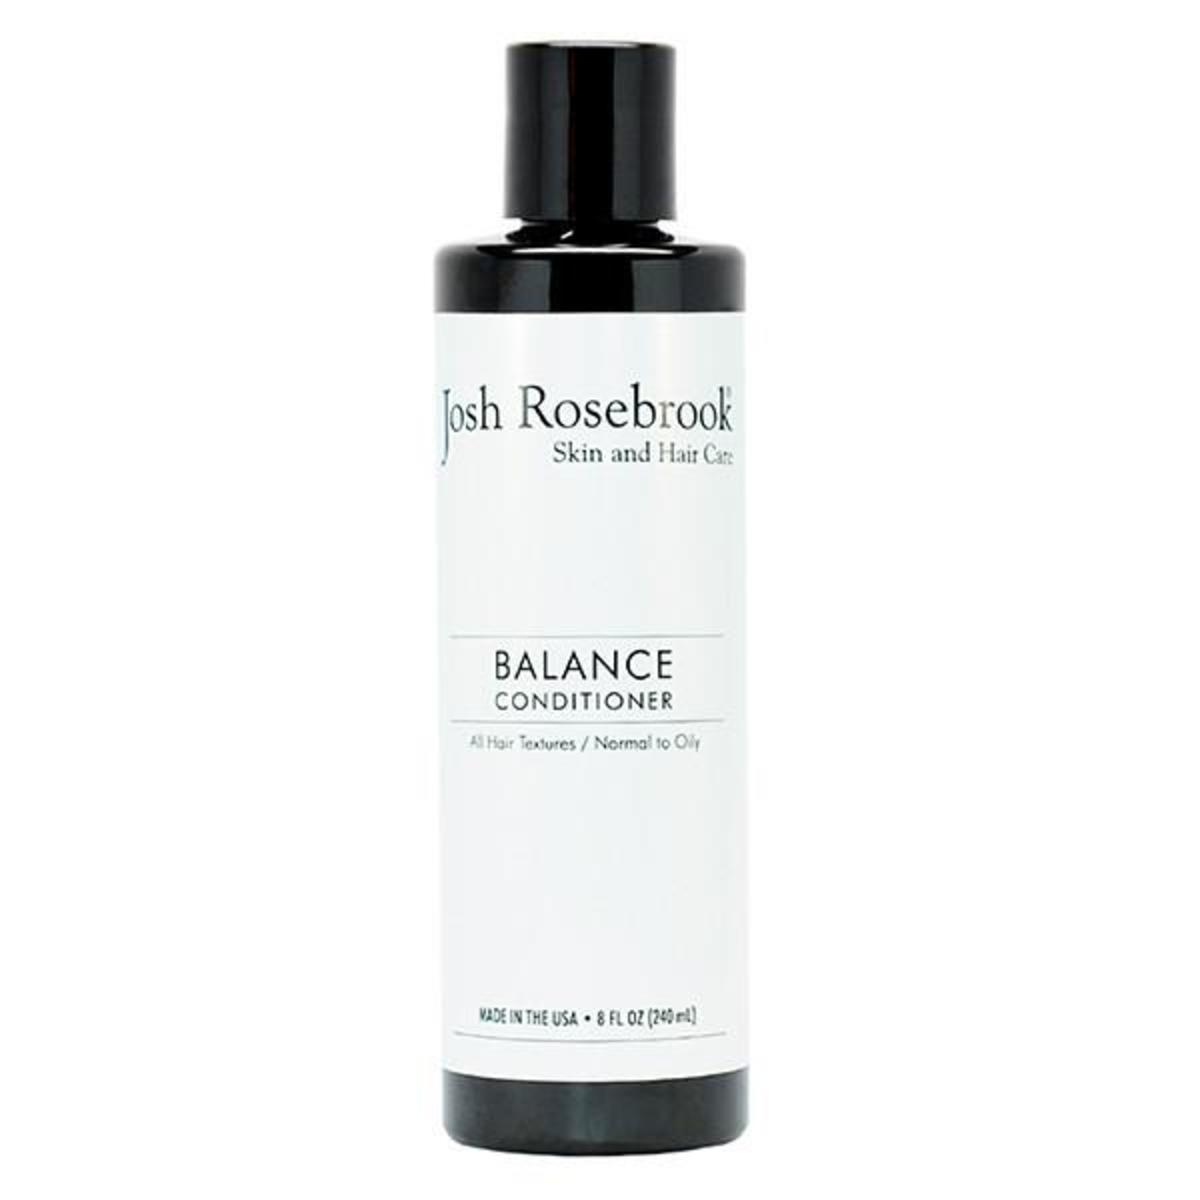 Josh Rosebrook Balance Conditioner